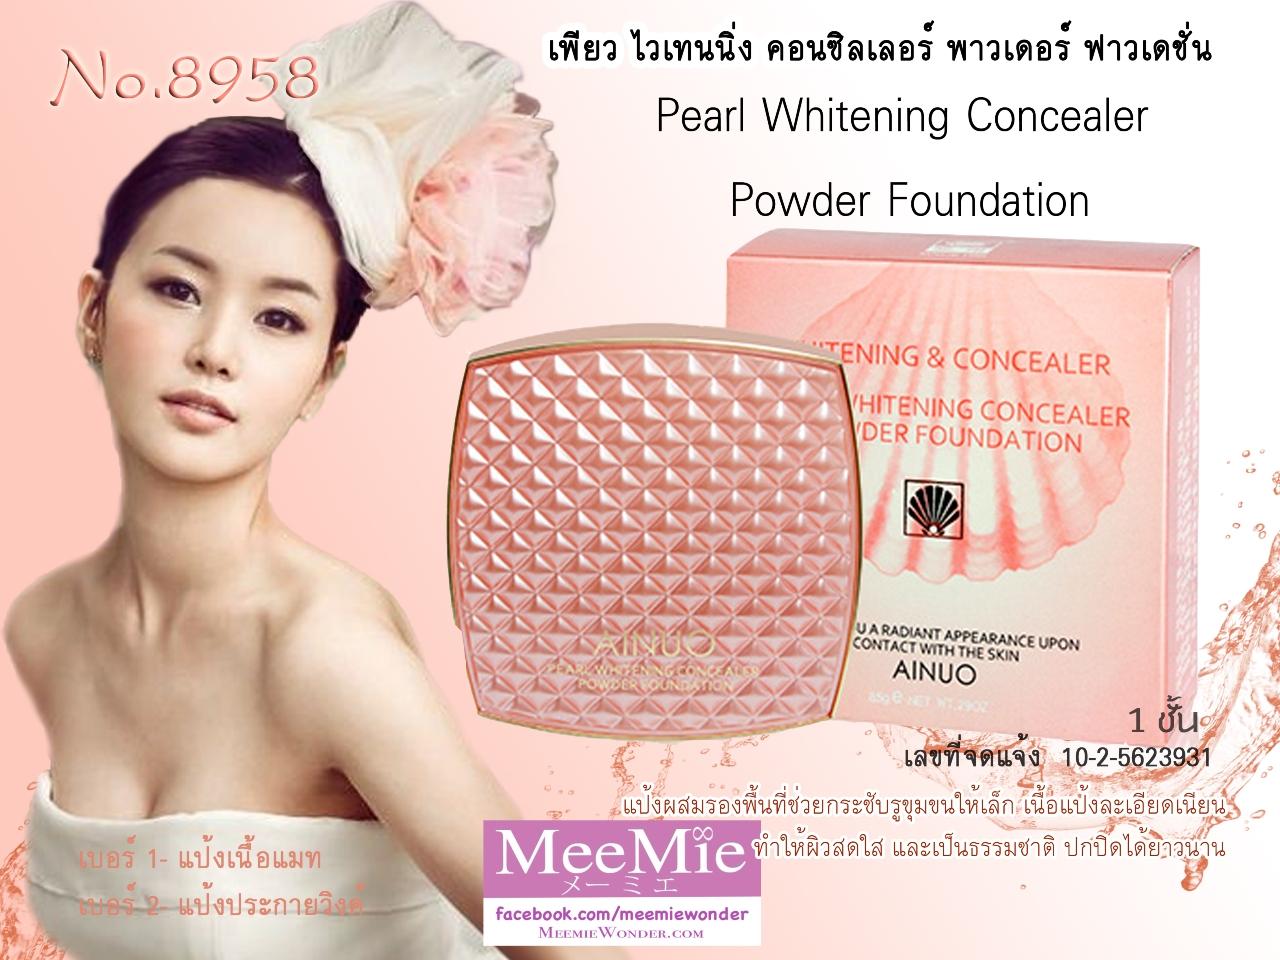 No.8958-1 แป้งพัฟ Pearl Whitening Concealer Powder Foundation เบอร์1 เนื้อแมทต์